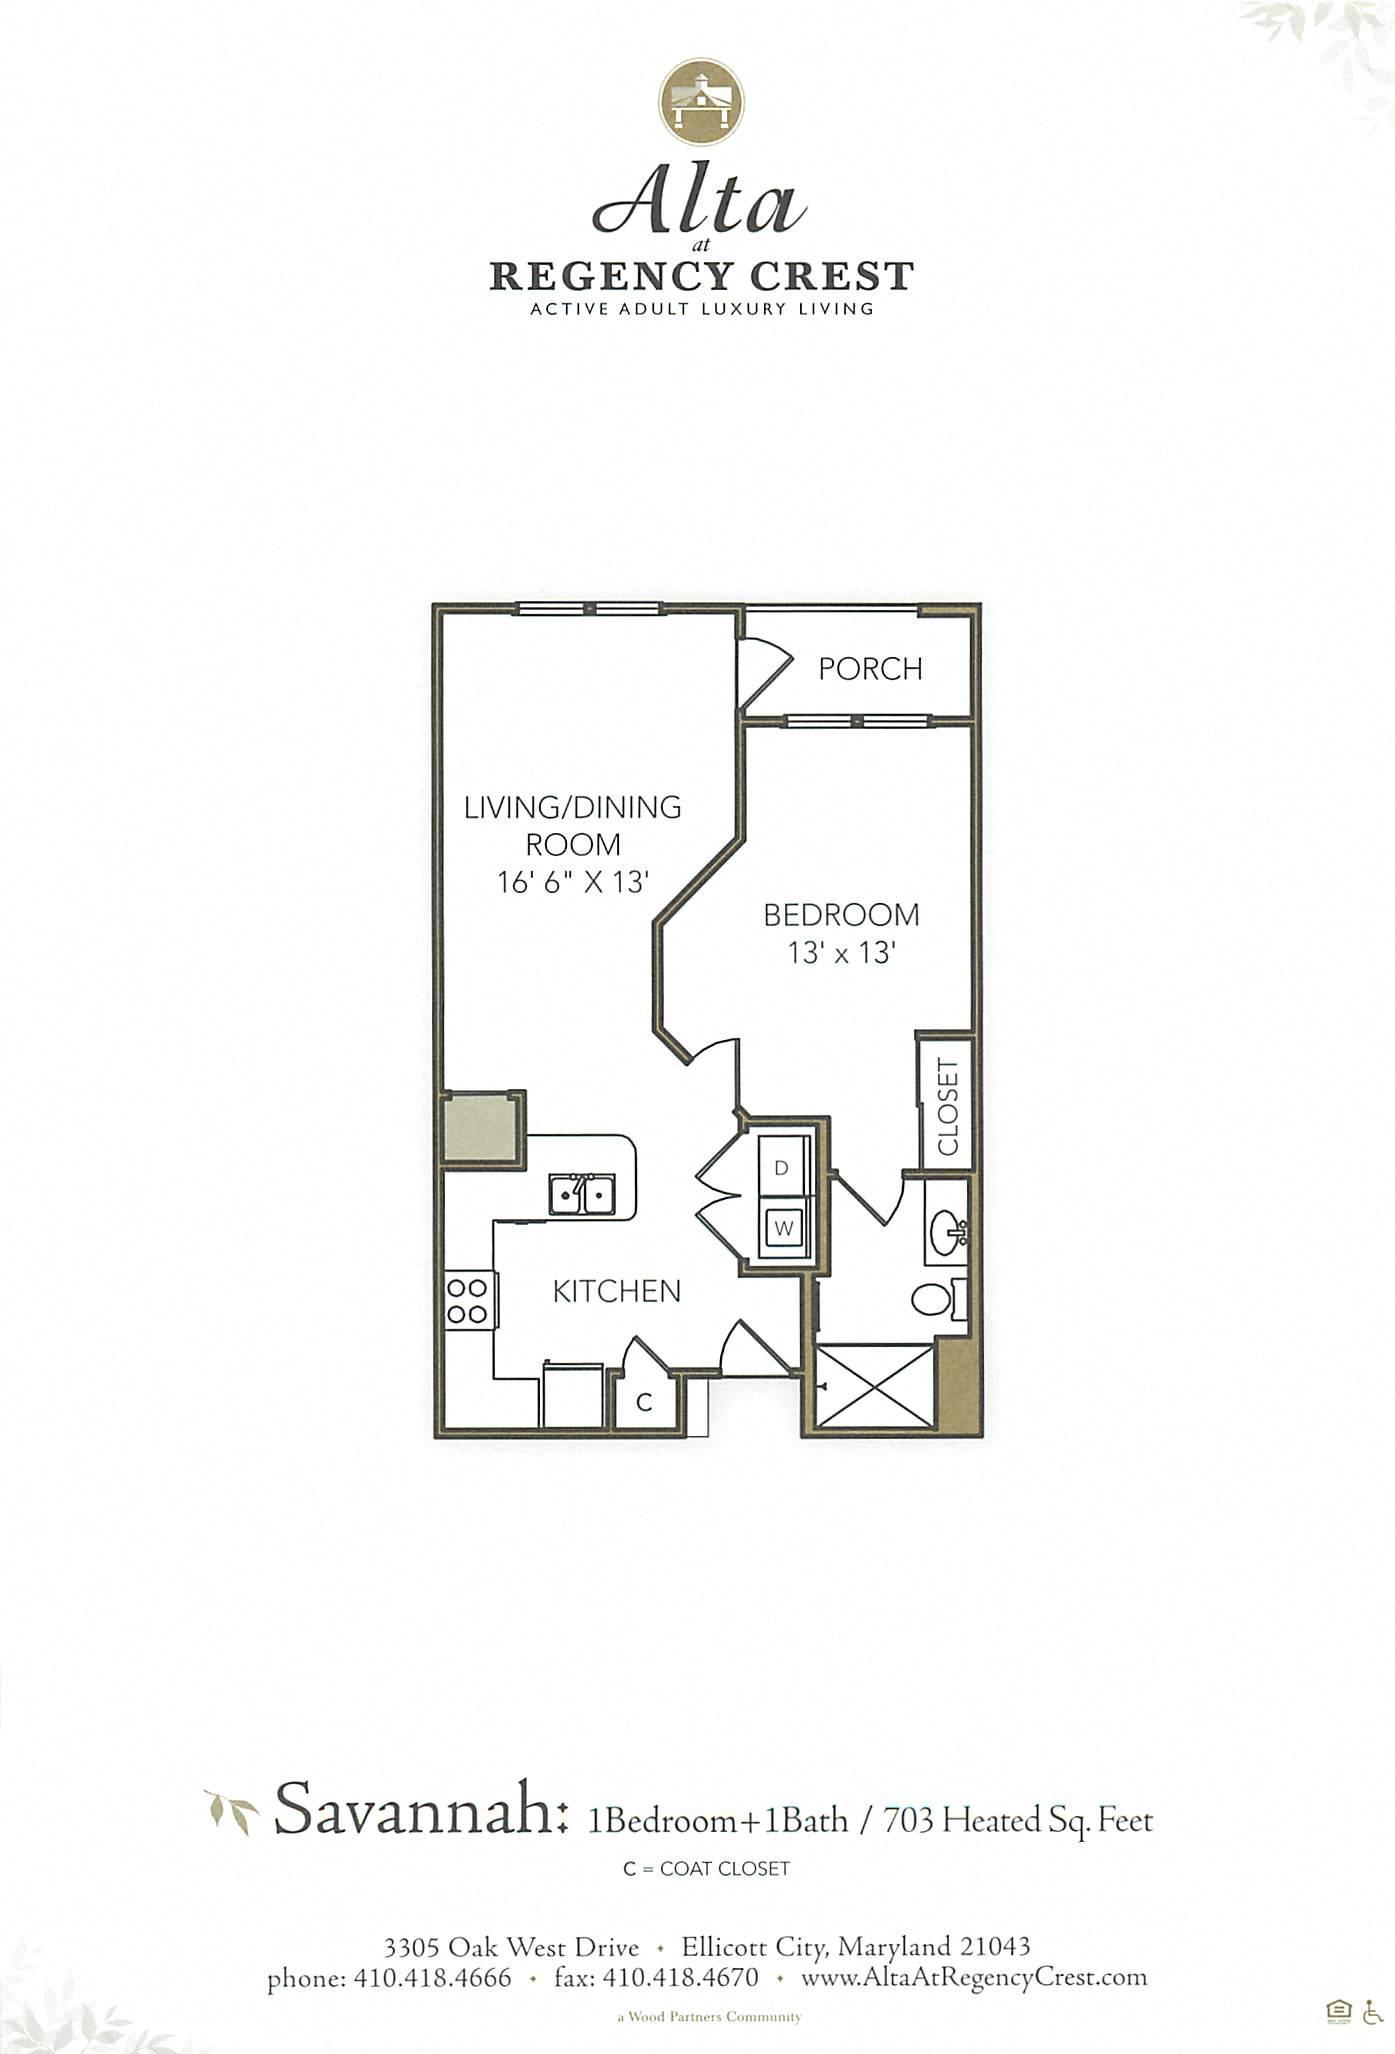 1 Bed/1 Bath MIHU-Savannah Floor Plan 8